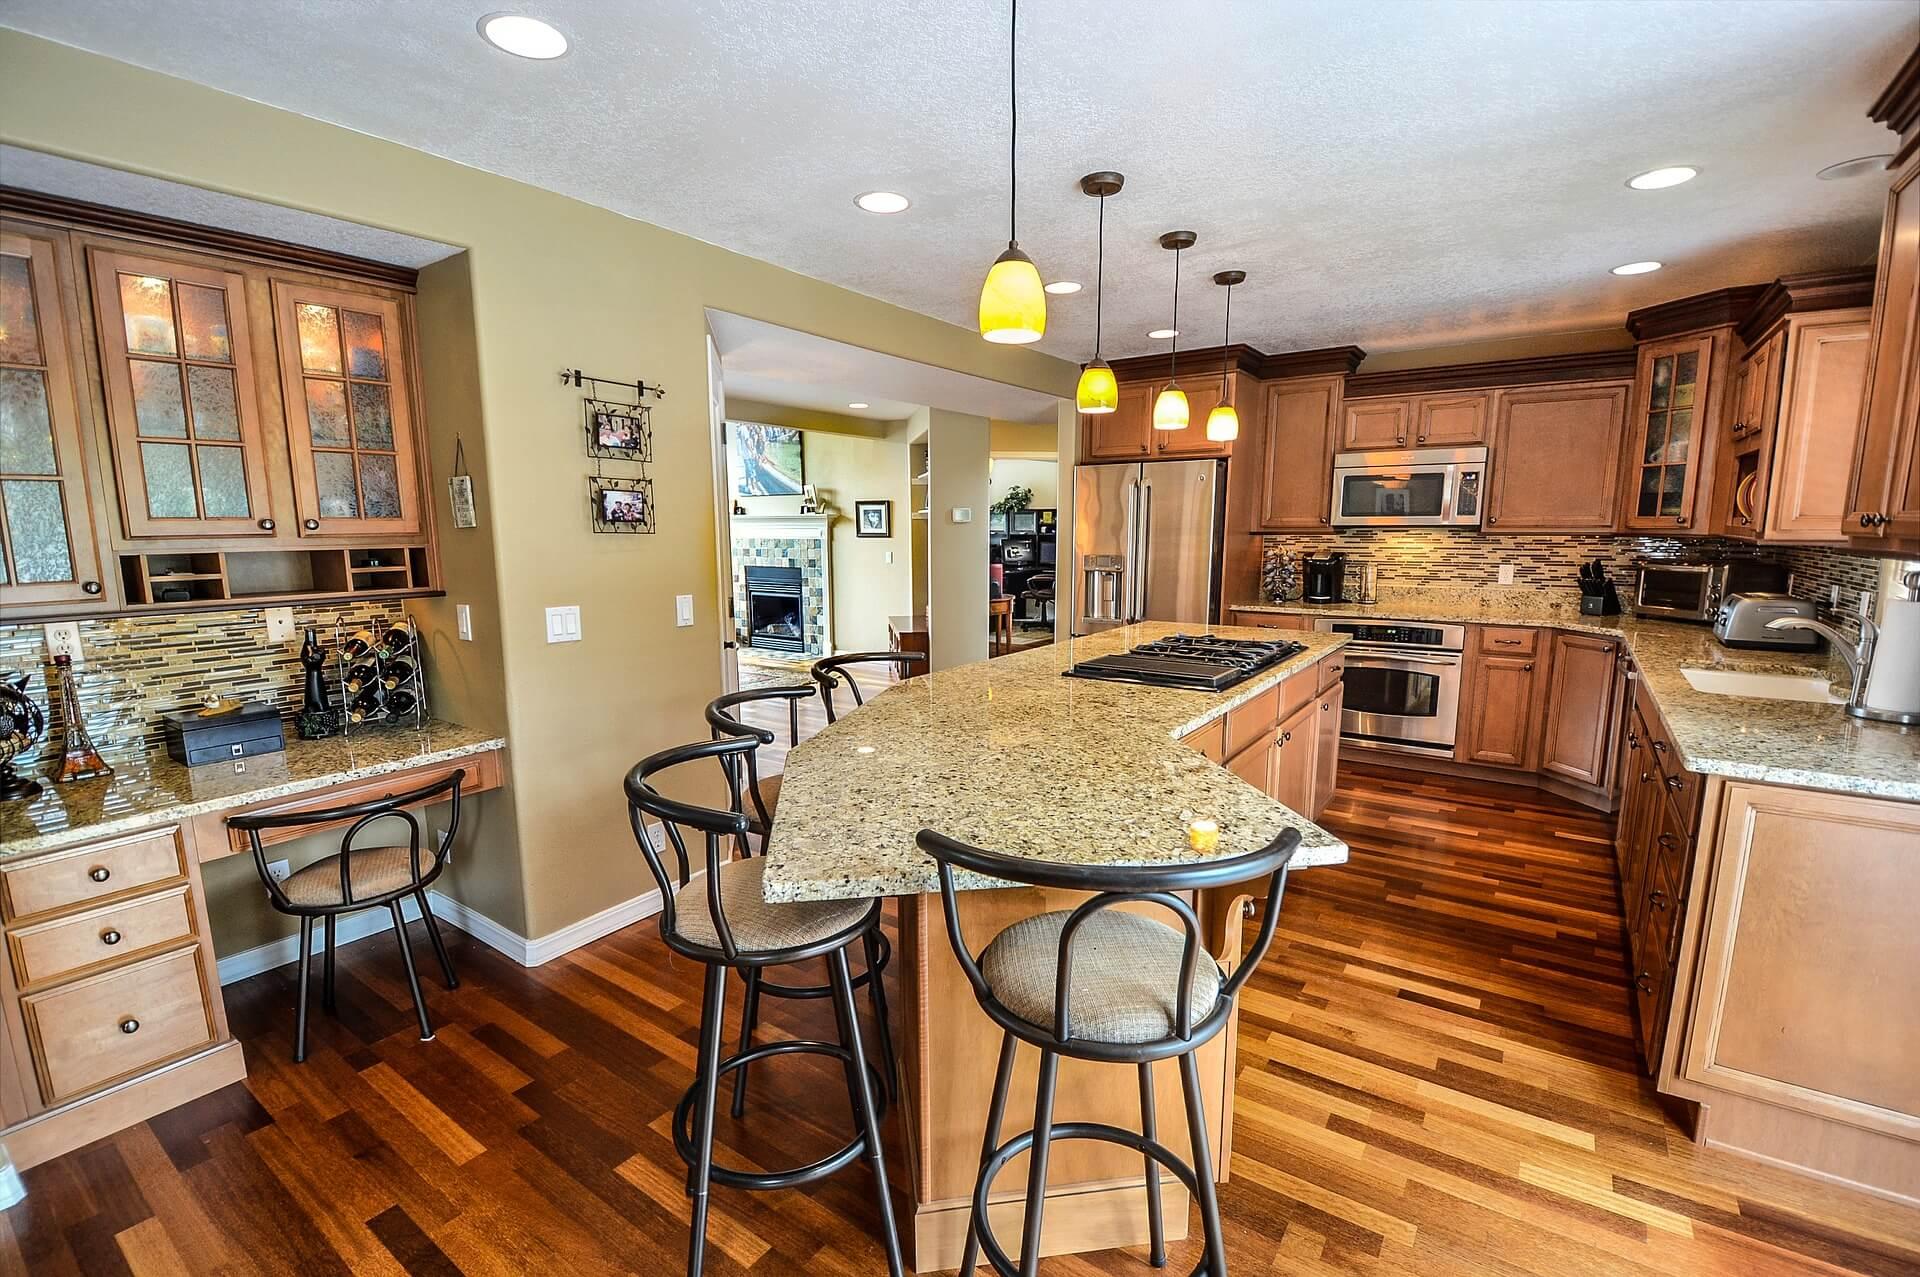 factors that affect a kitchen remodel timeline